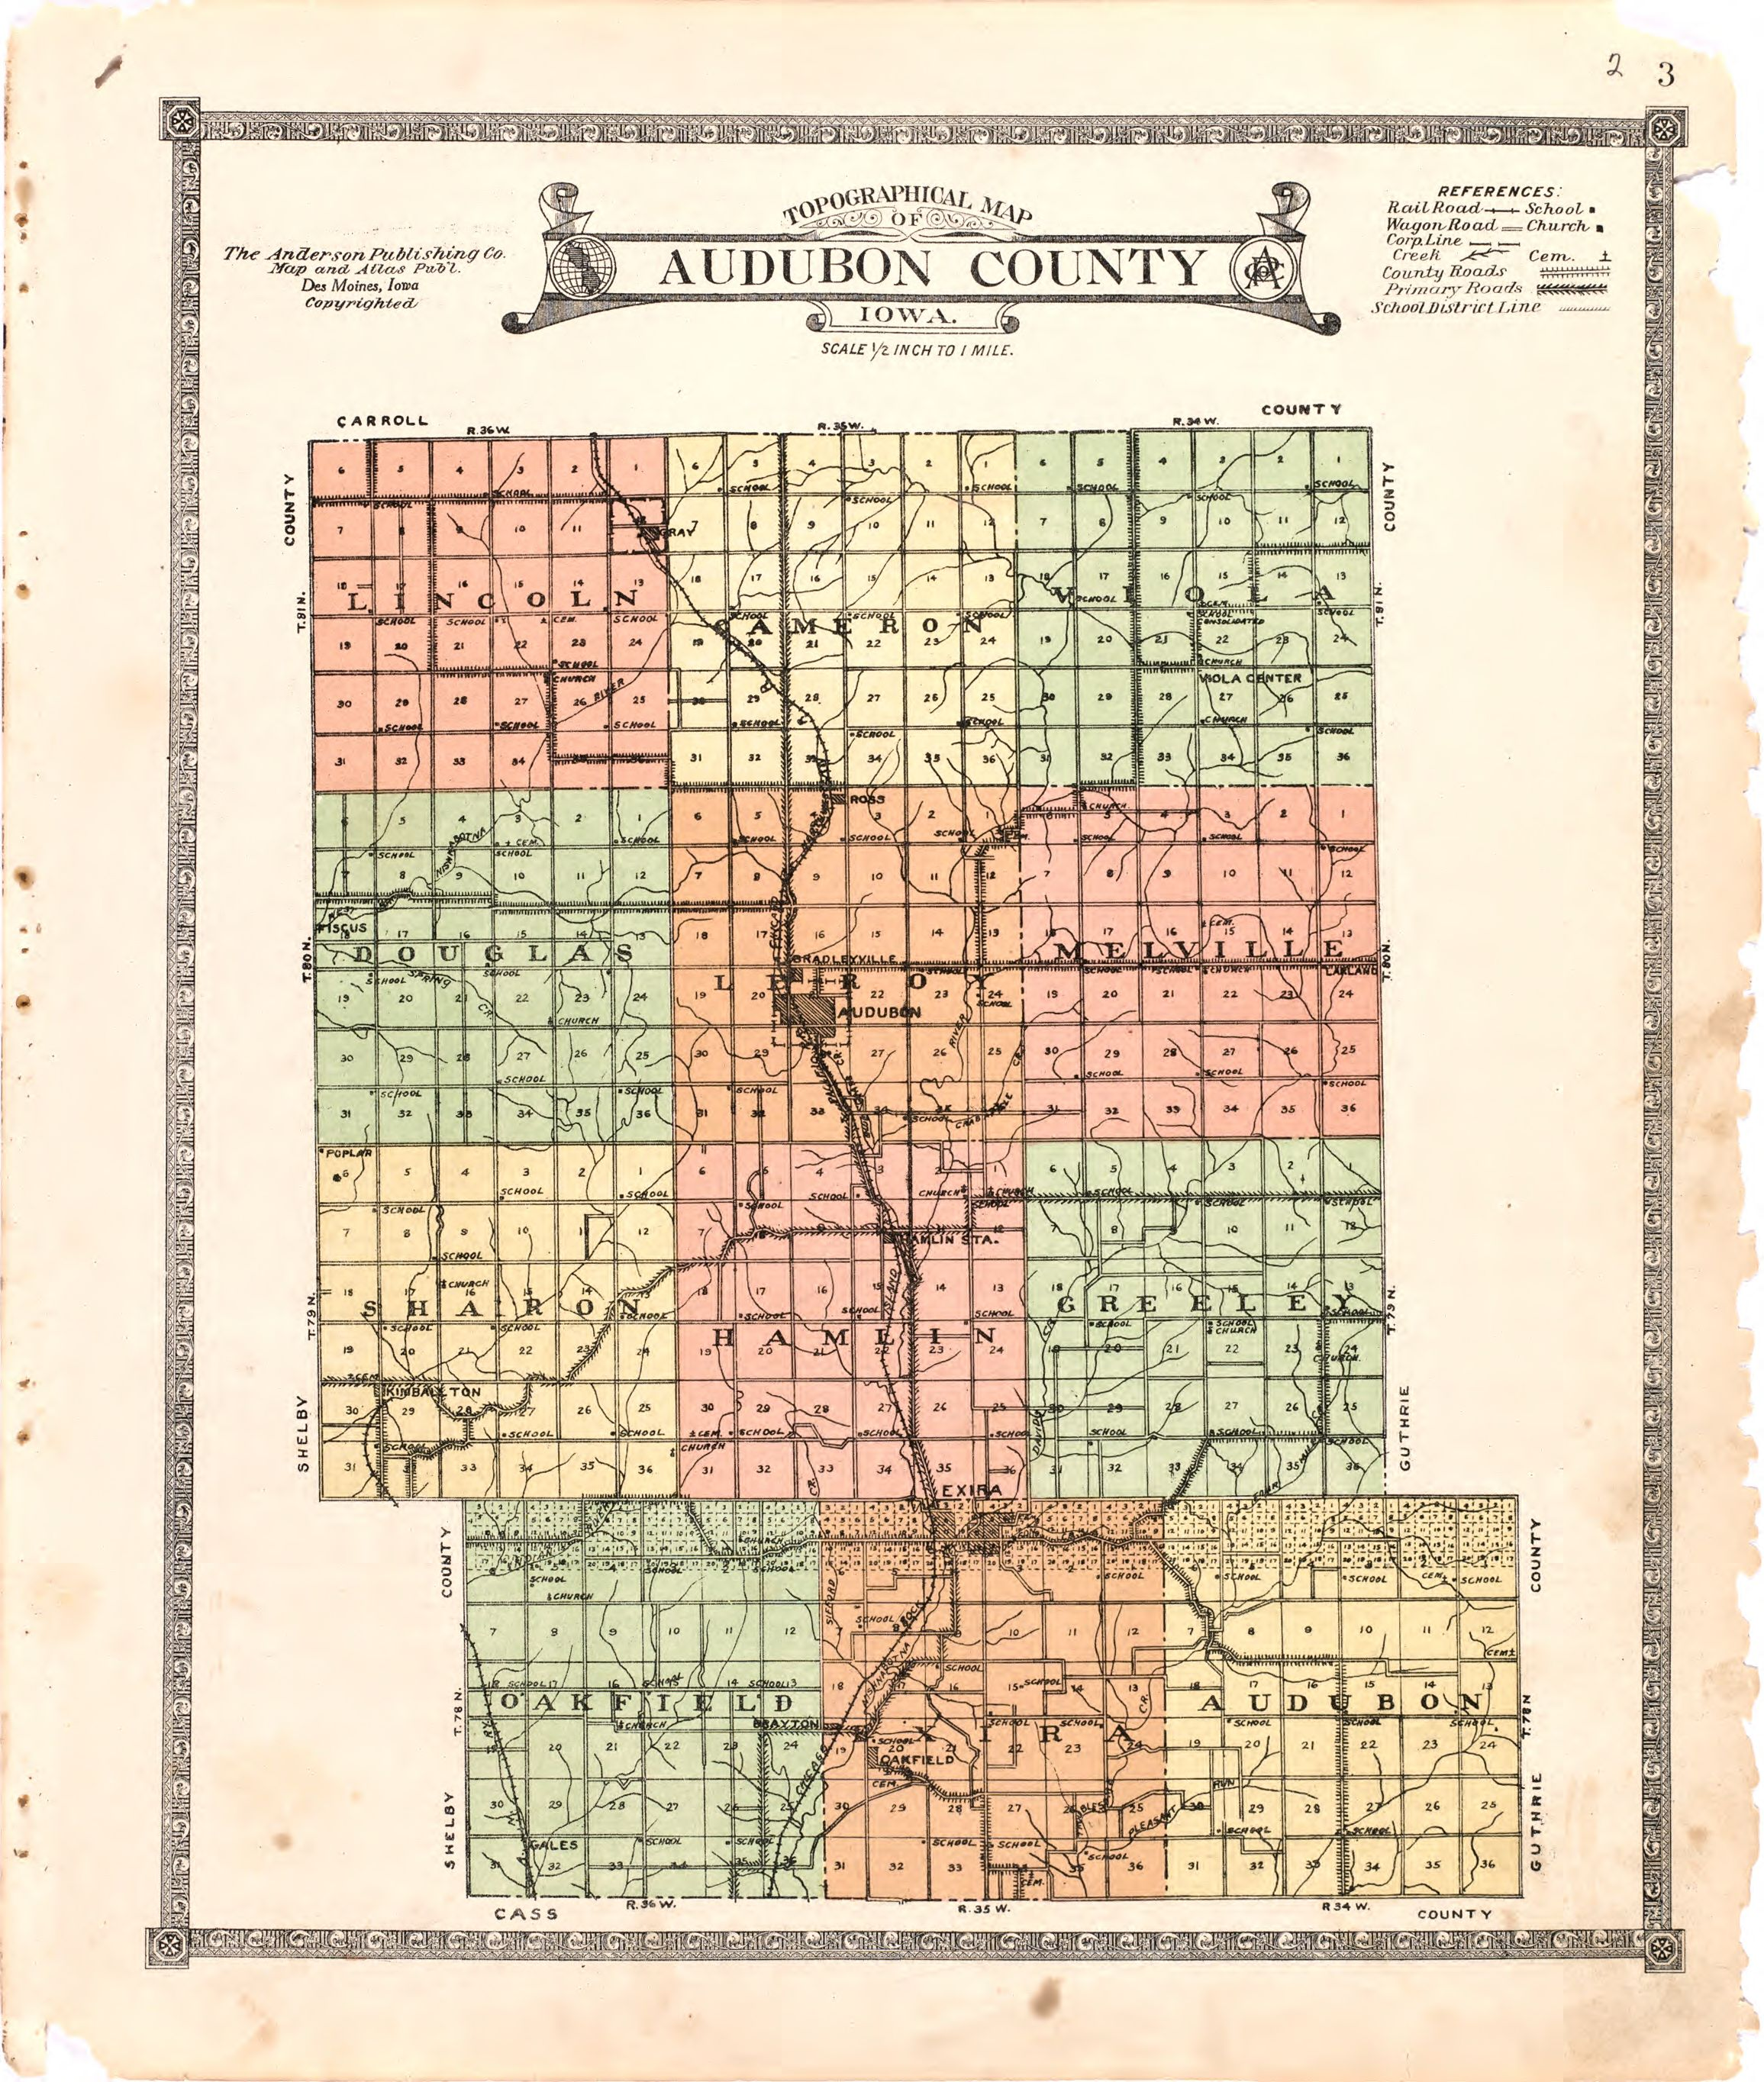 Audubon Iowa Map.File Atlas Of Audubon County Iowa Containing Maps Of Townships Of